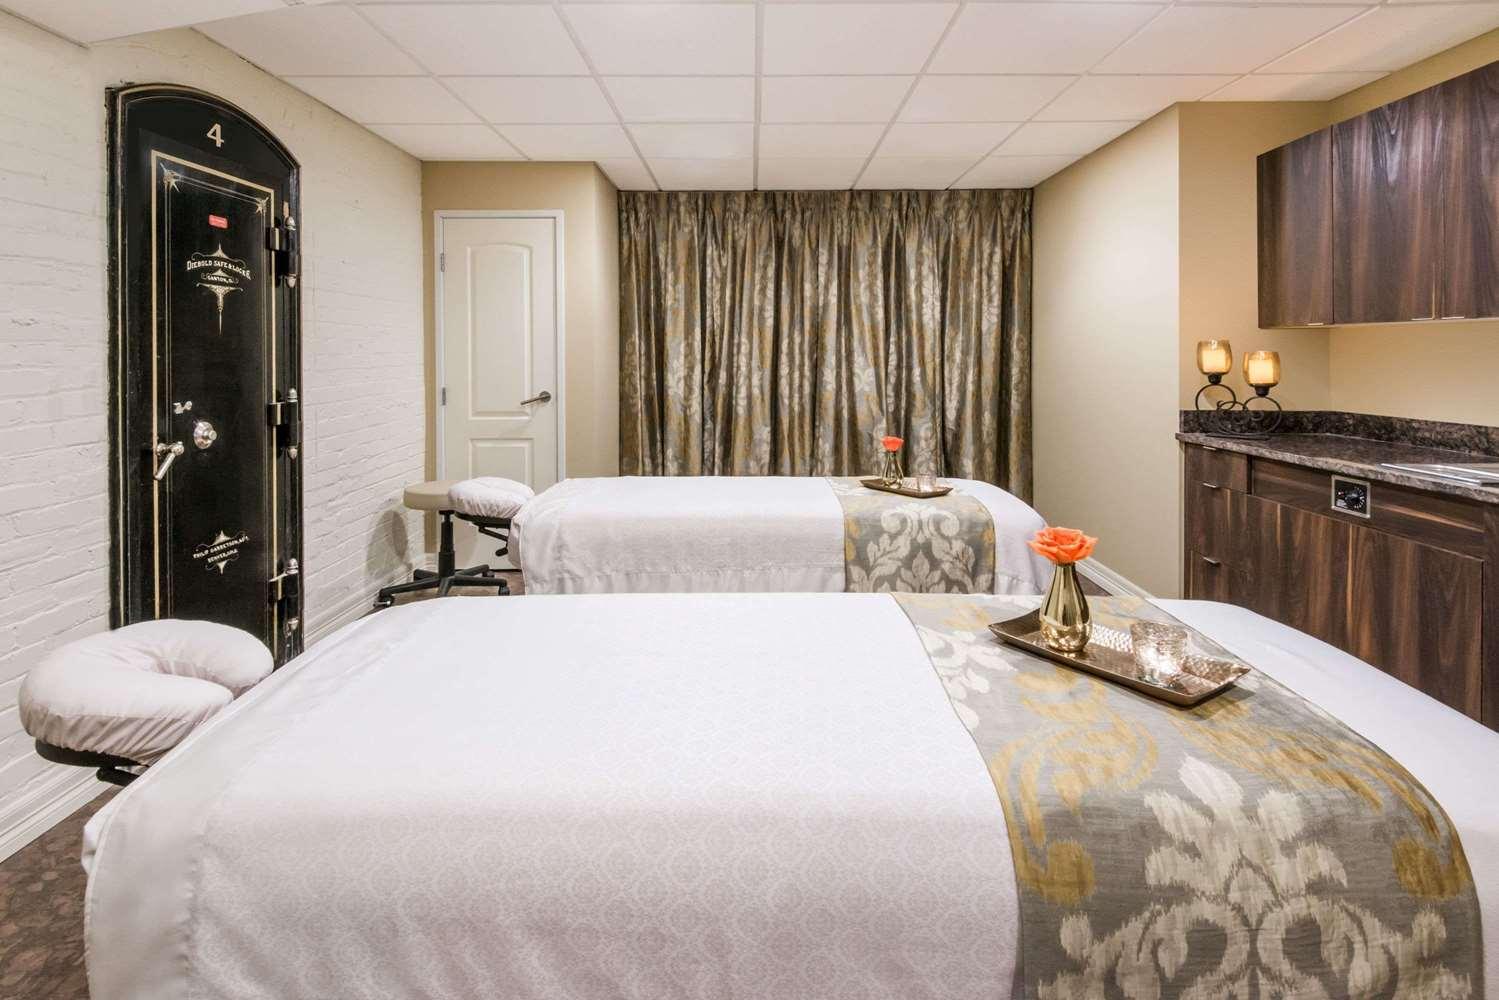 Spa - Wyndham Grand Mining Exchange Hotel Colorado Springs